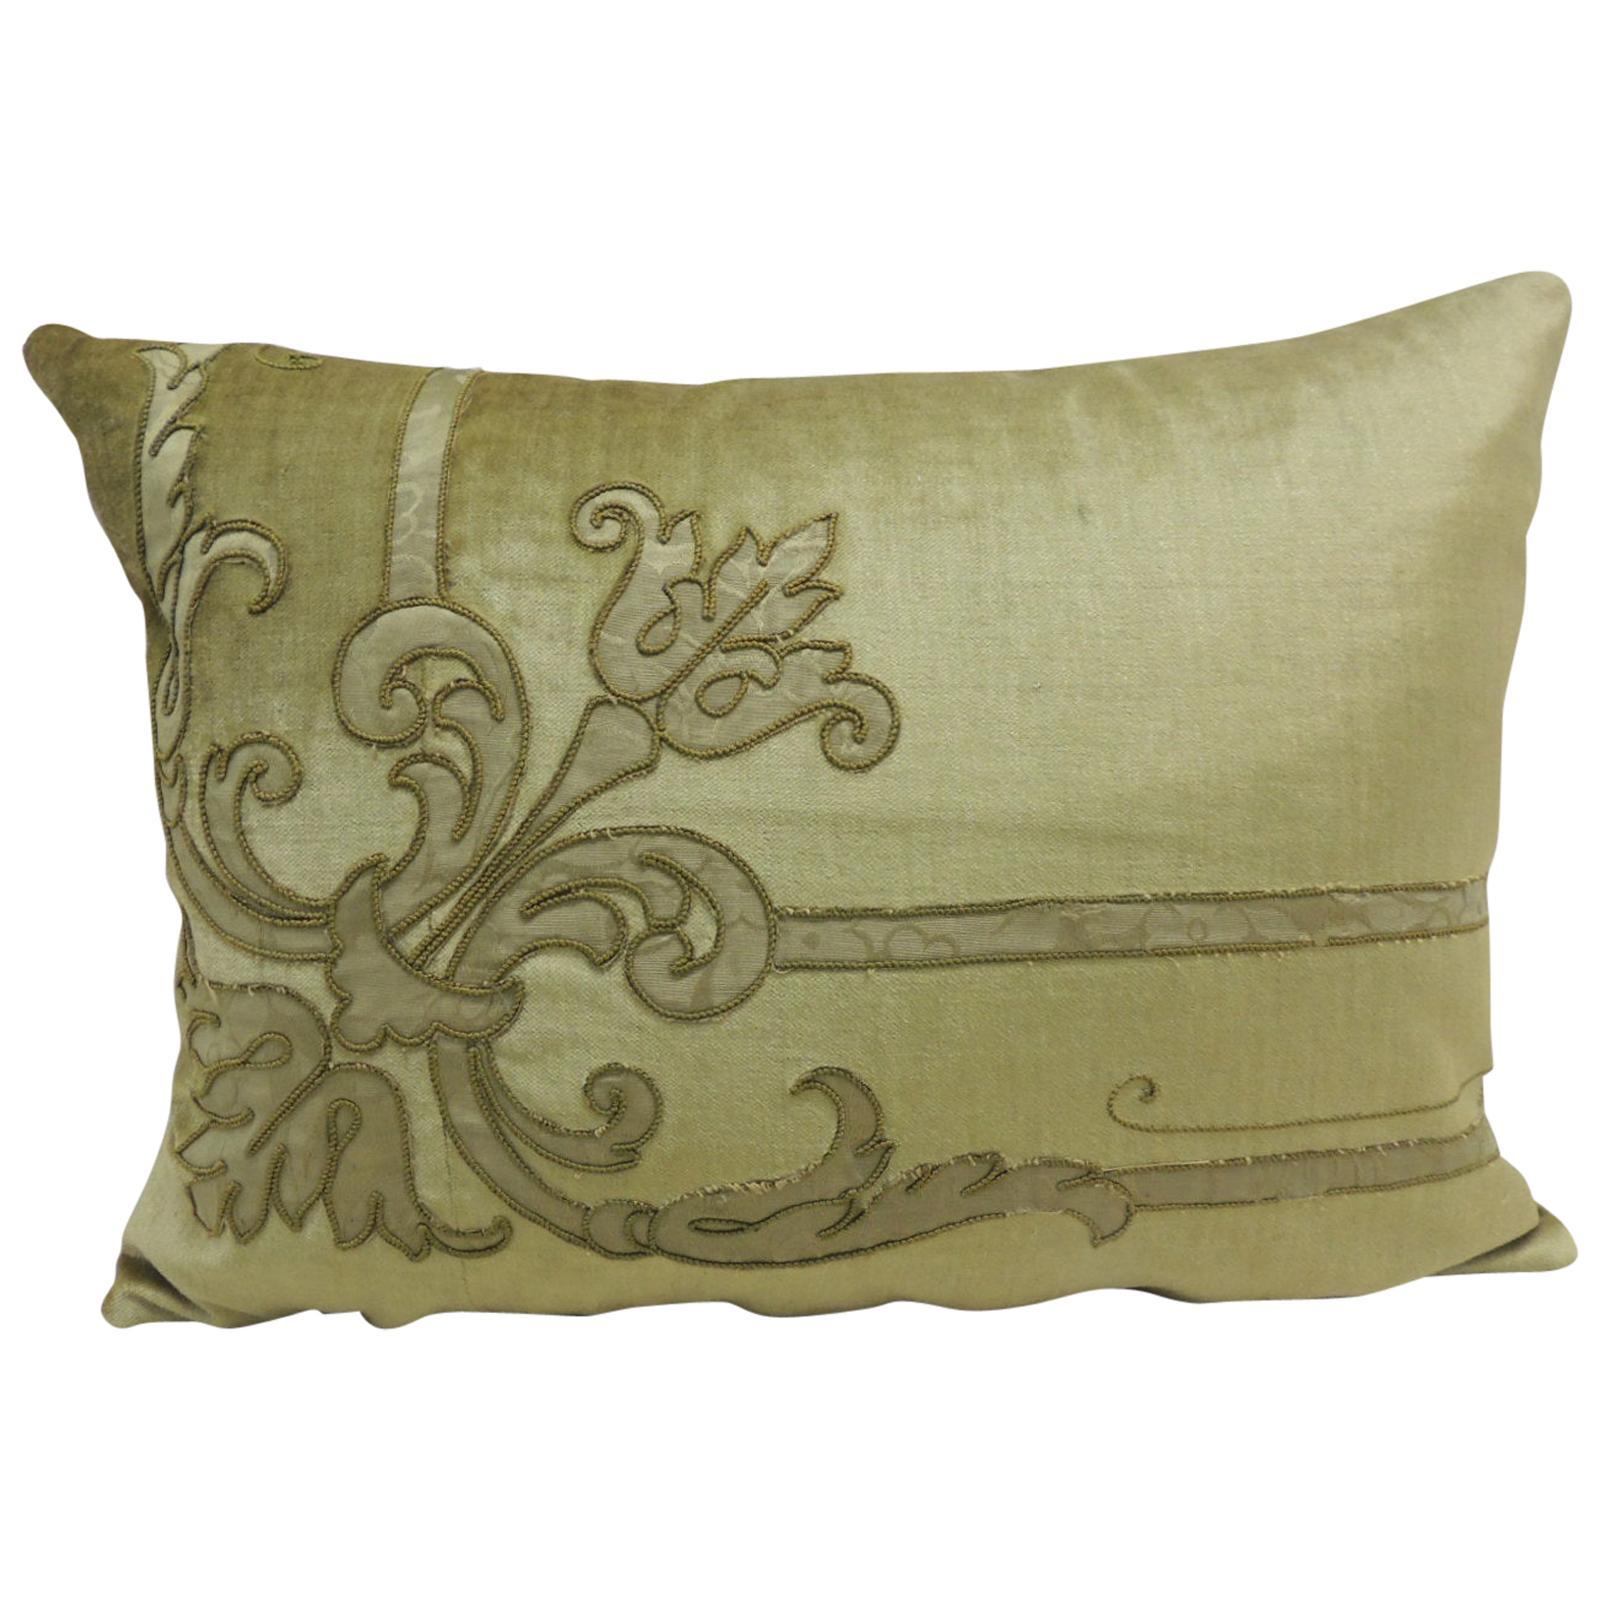 Antique Silk Velvet Olive Green Applique Decorative Bolster Pillow